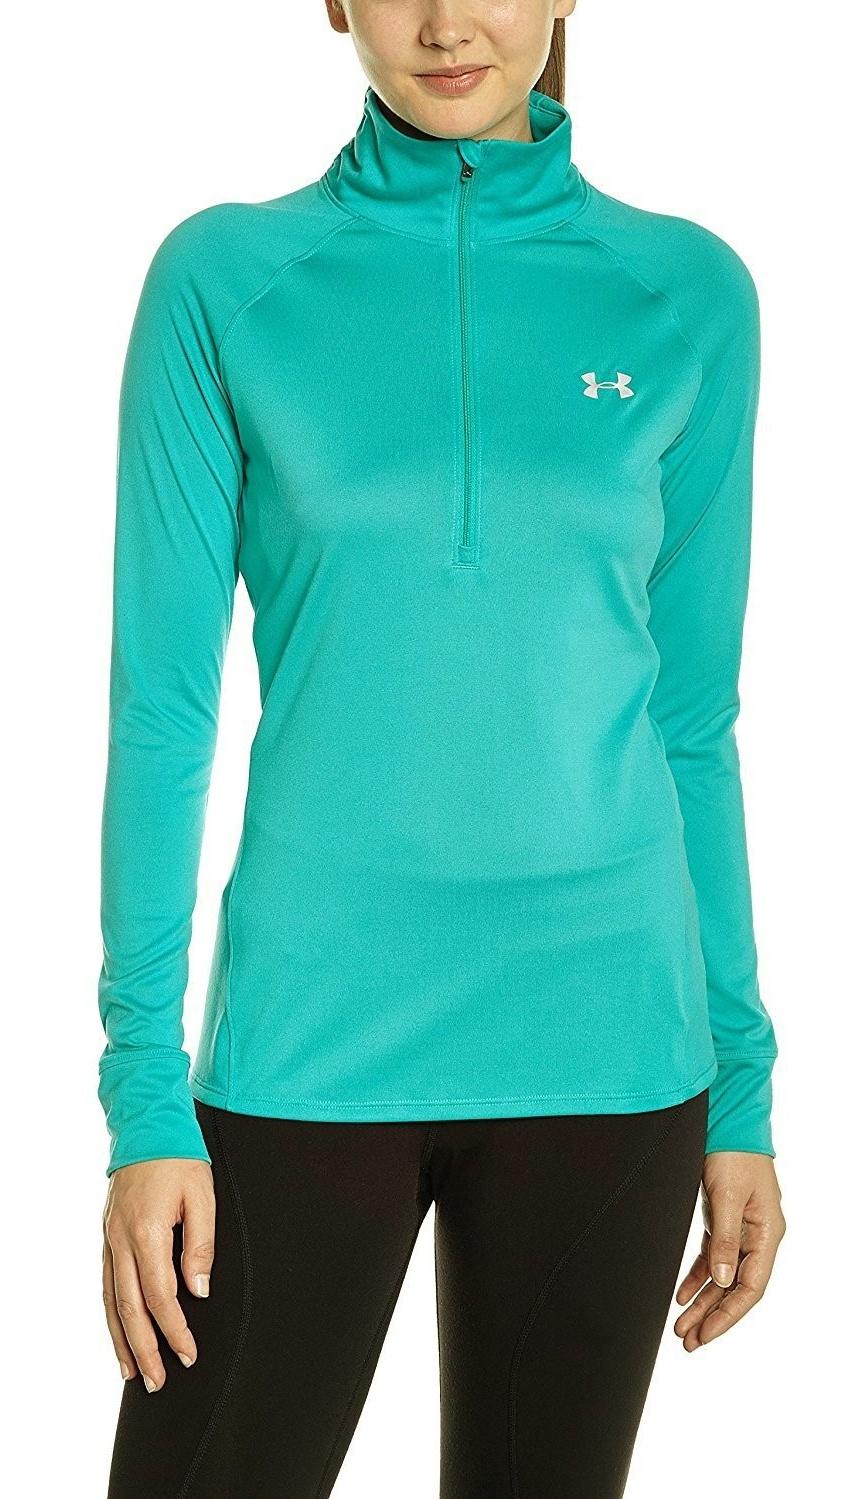 Women/'s Under Armour Tech 1//2 Zip Long Sleeve Shirt Top Choose Size /& Color H